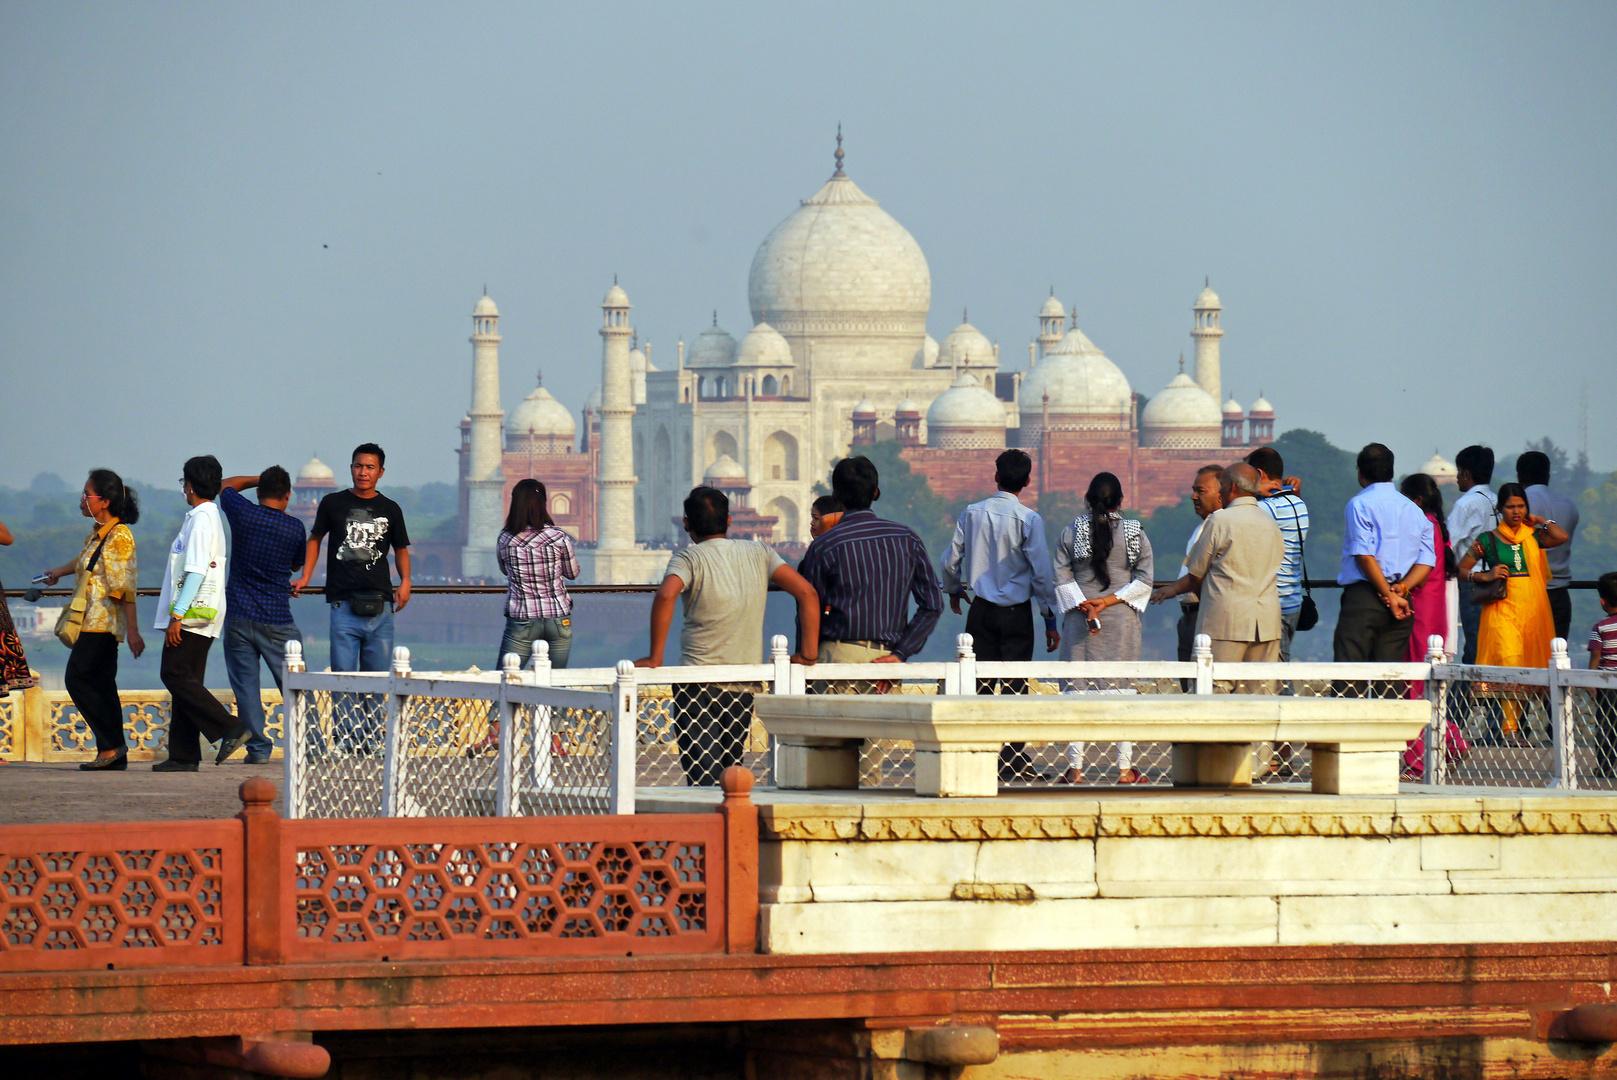 Blick vom Roten Fort auf das Taj Mahal